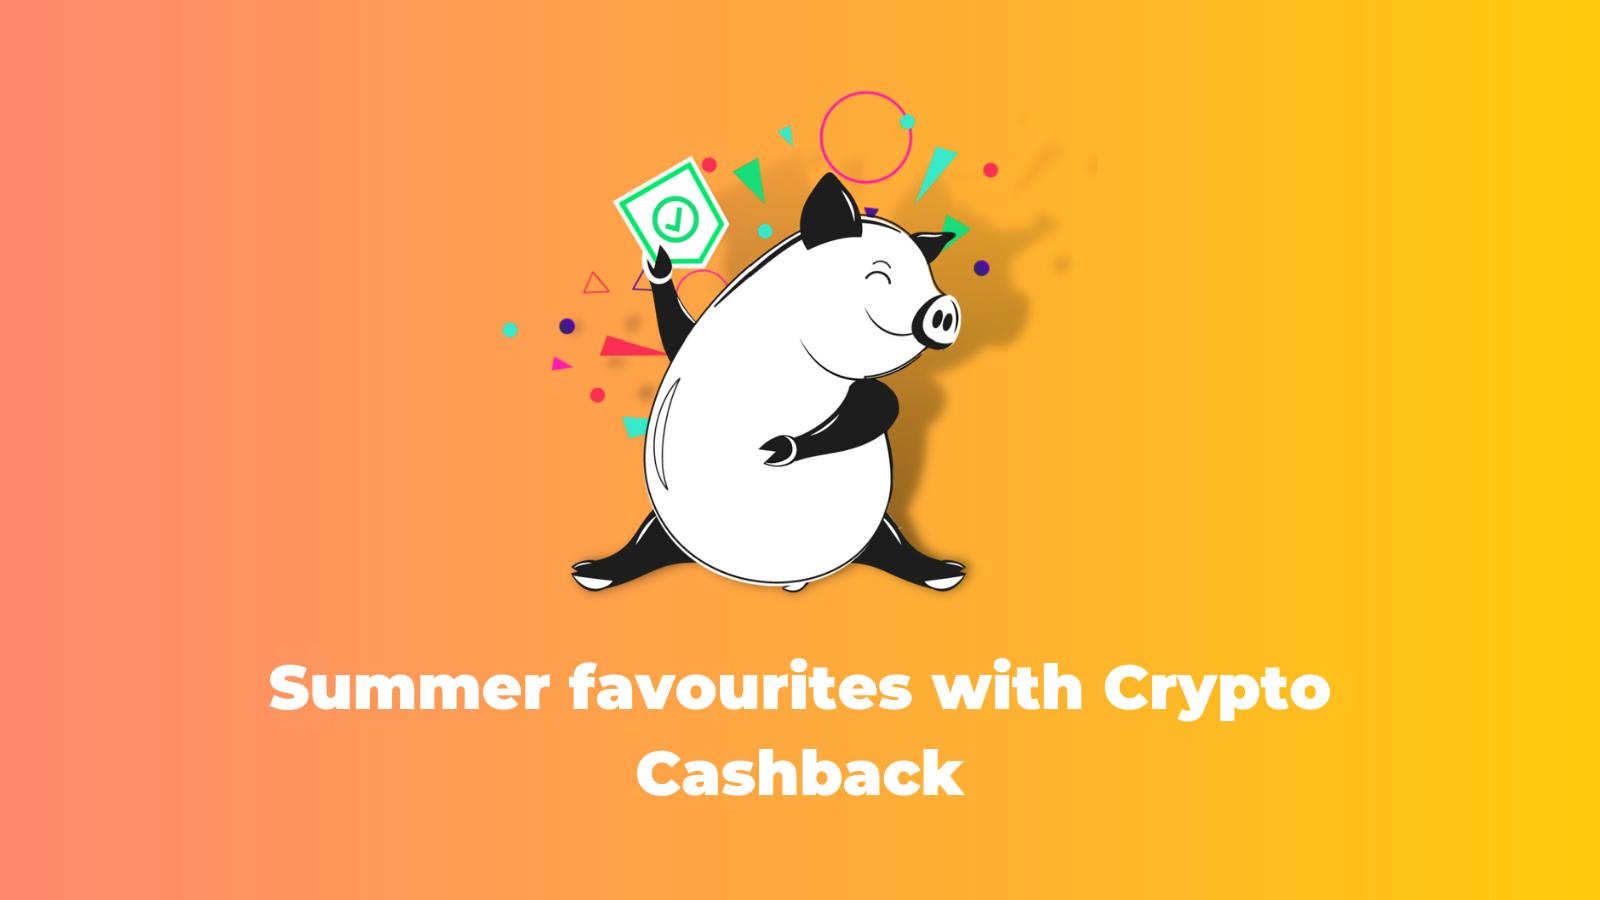 Summer picks with Crypto Cashback